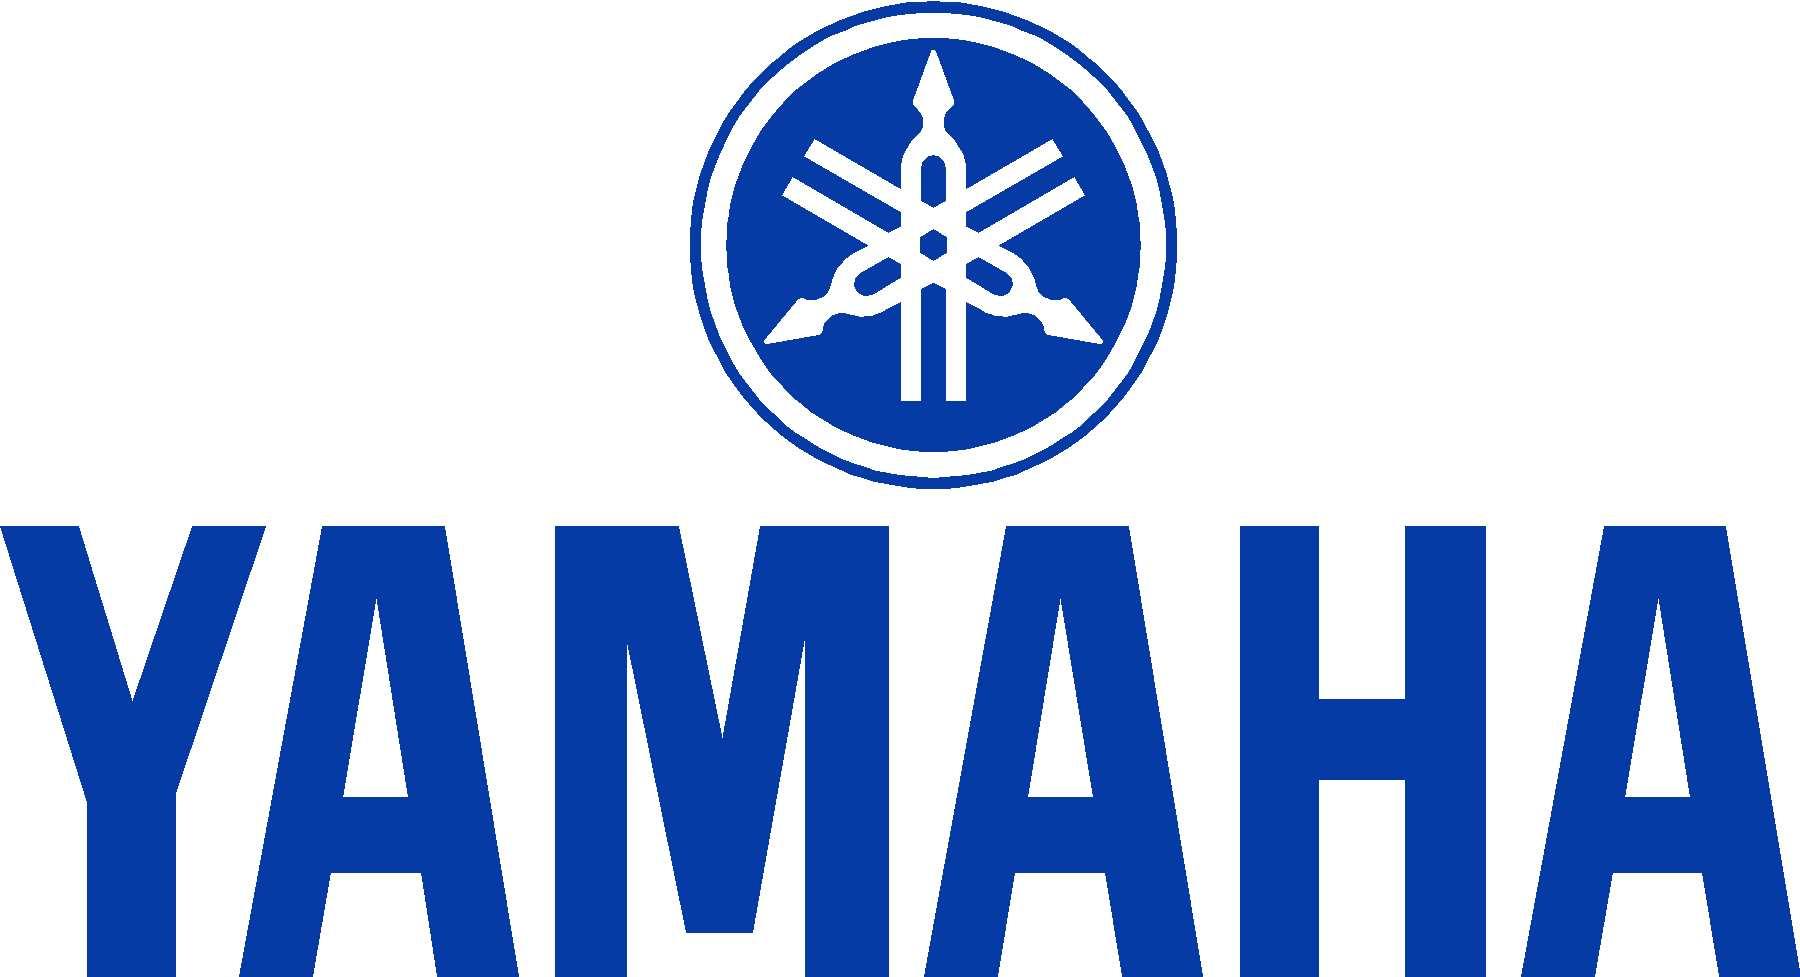 Hd wallpaper yamaha r1 - Yamaha Logo Wallpaper Wallpapersafari